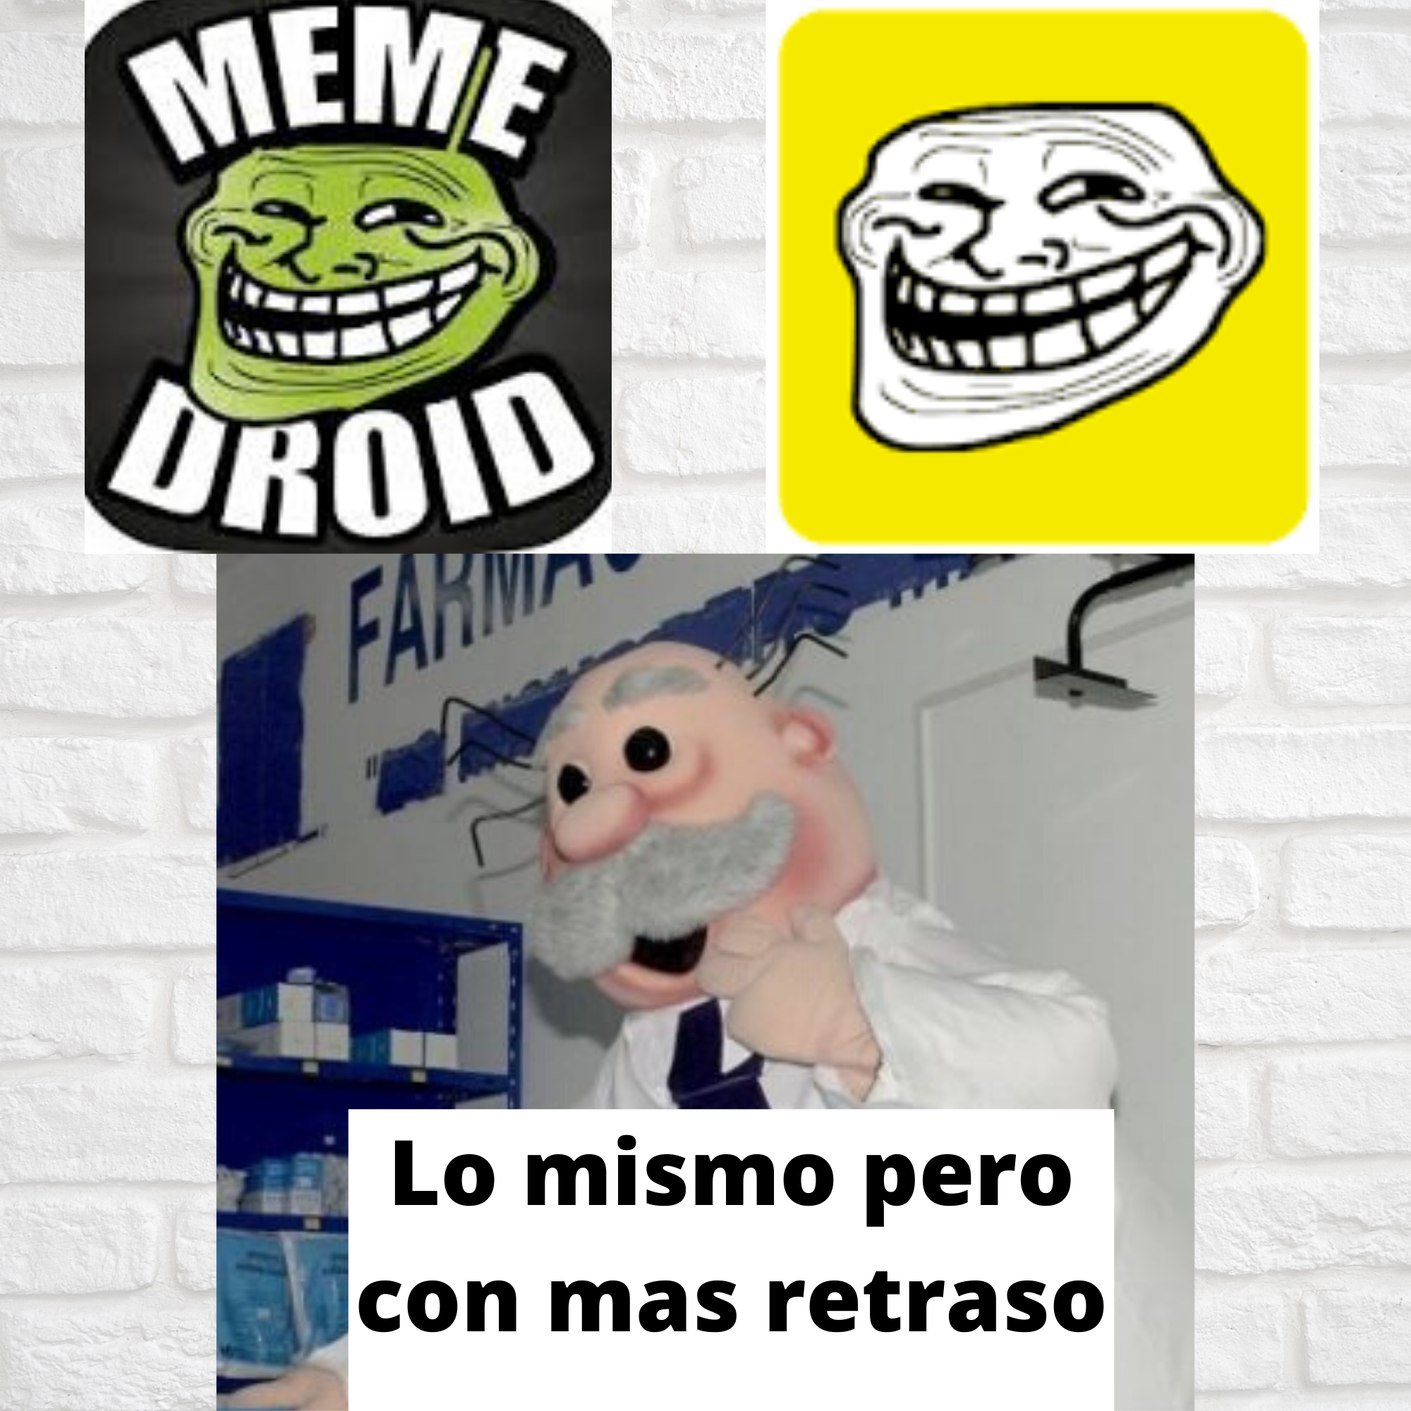 Tremendos subnormales los de memasik - meme